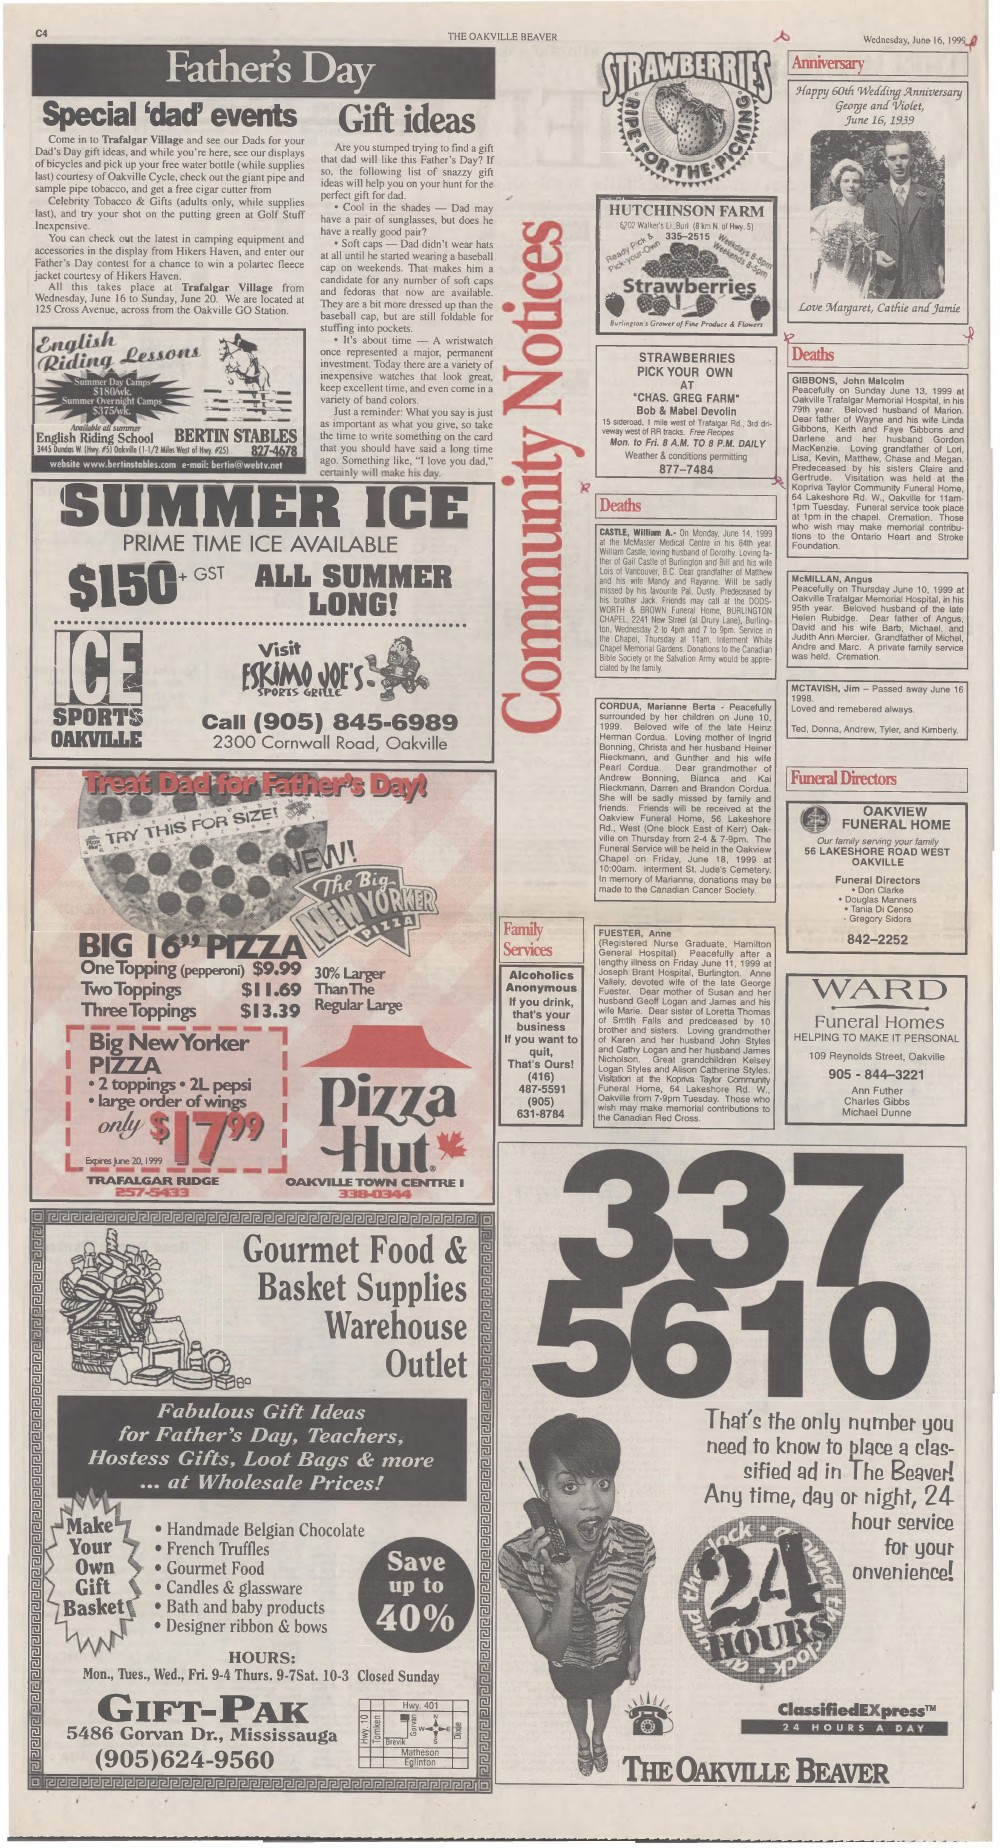 Oakville Beaver, 16 Jun 1999